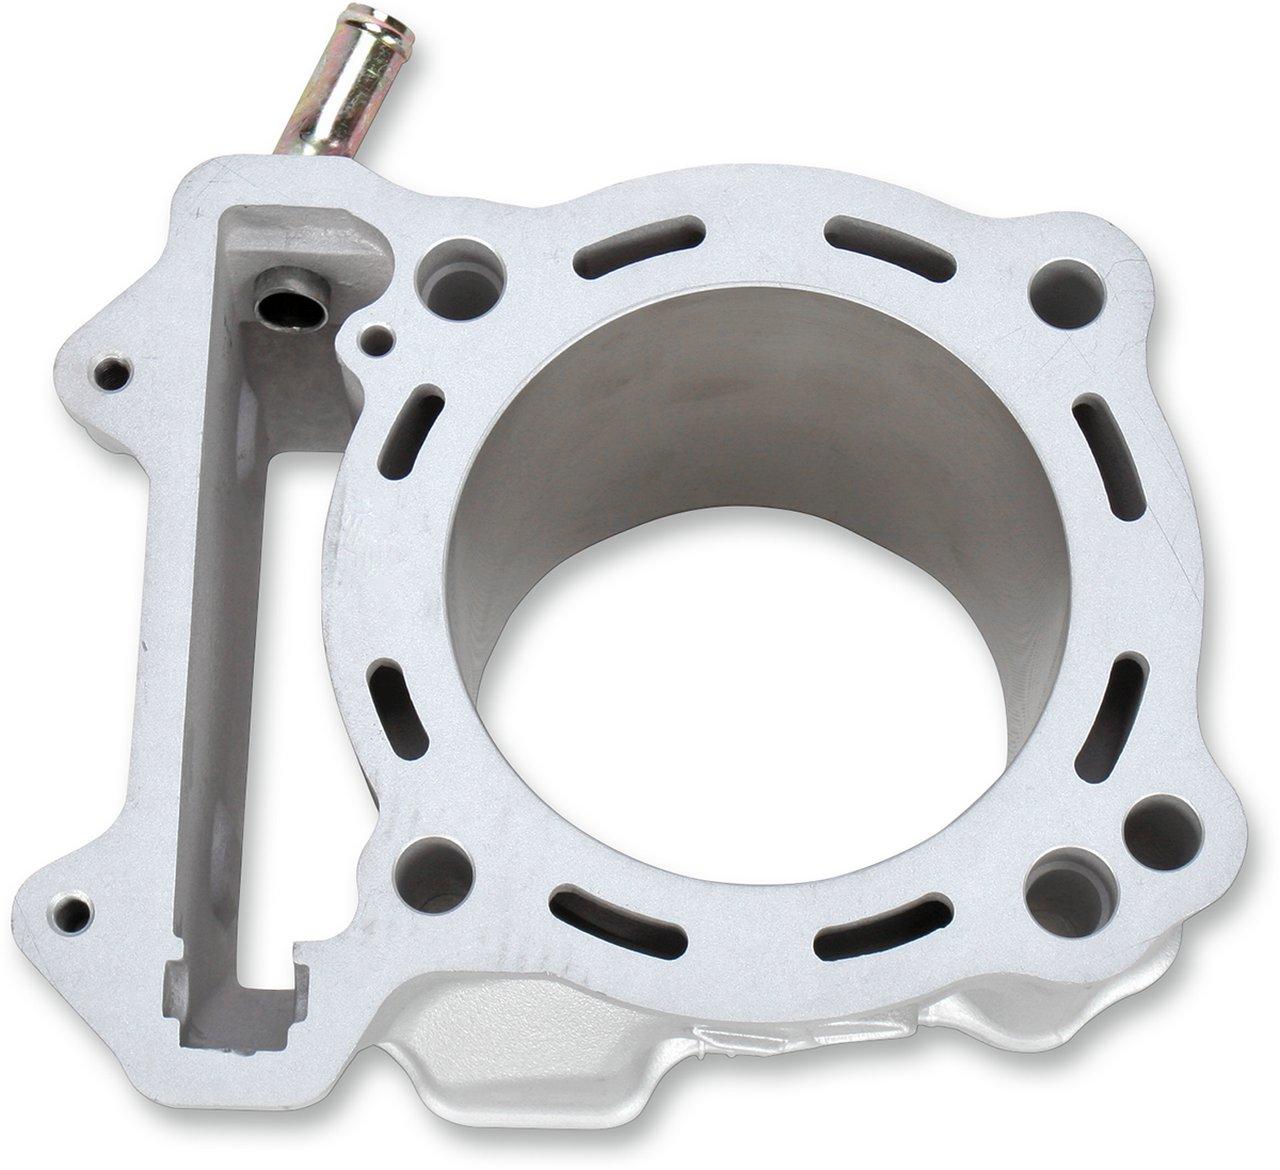 【MOOSE RACING】維修用汽缸 [0931-0460] - 「Webike-摩托百貨」